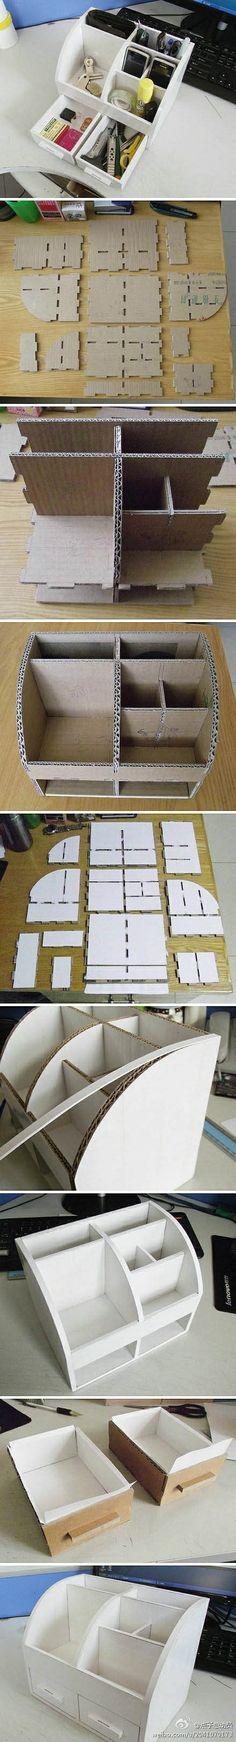 DIY cardboard desk organizer